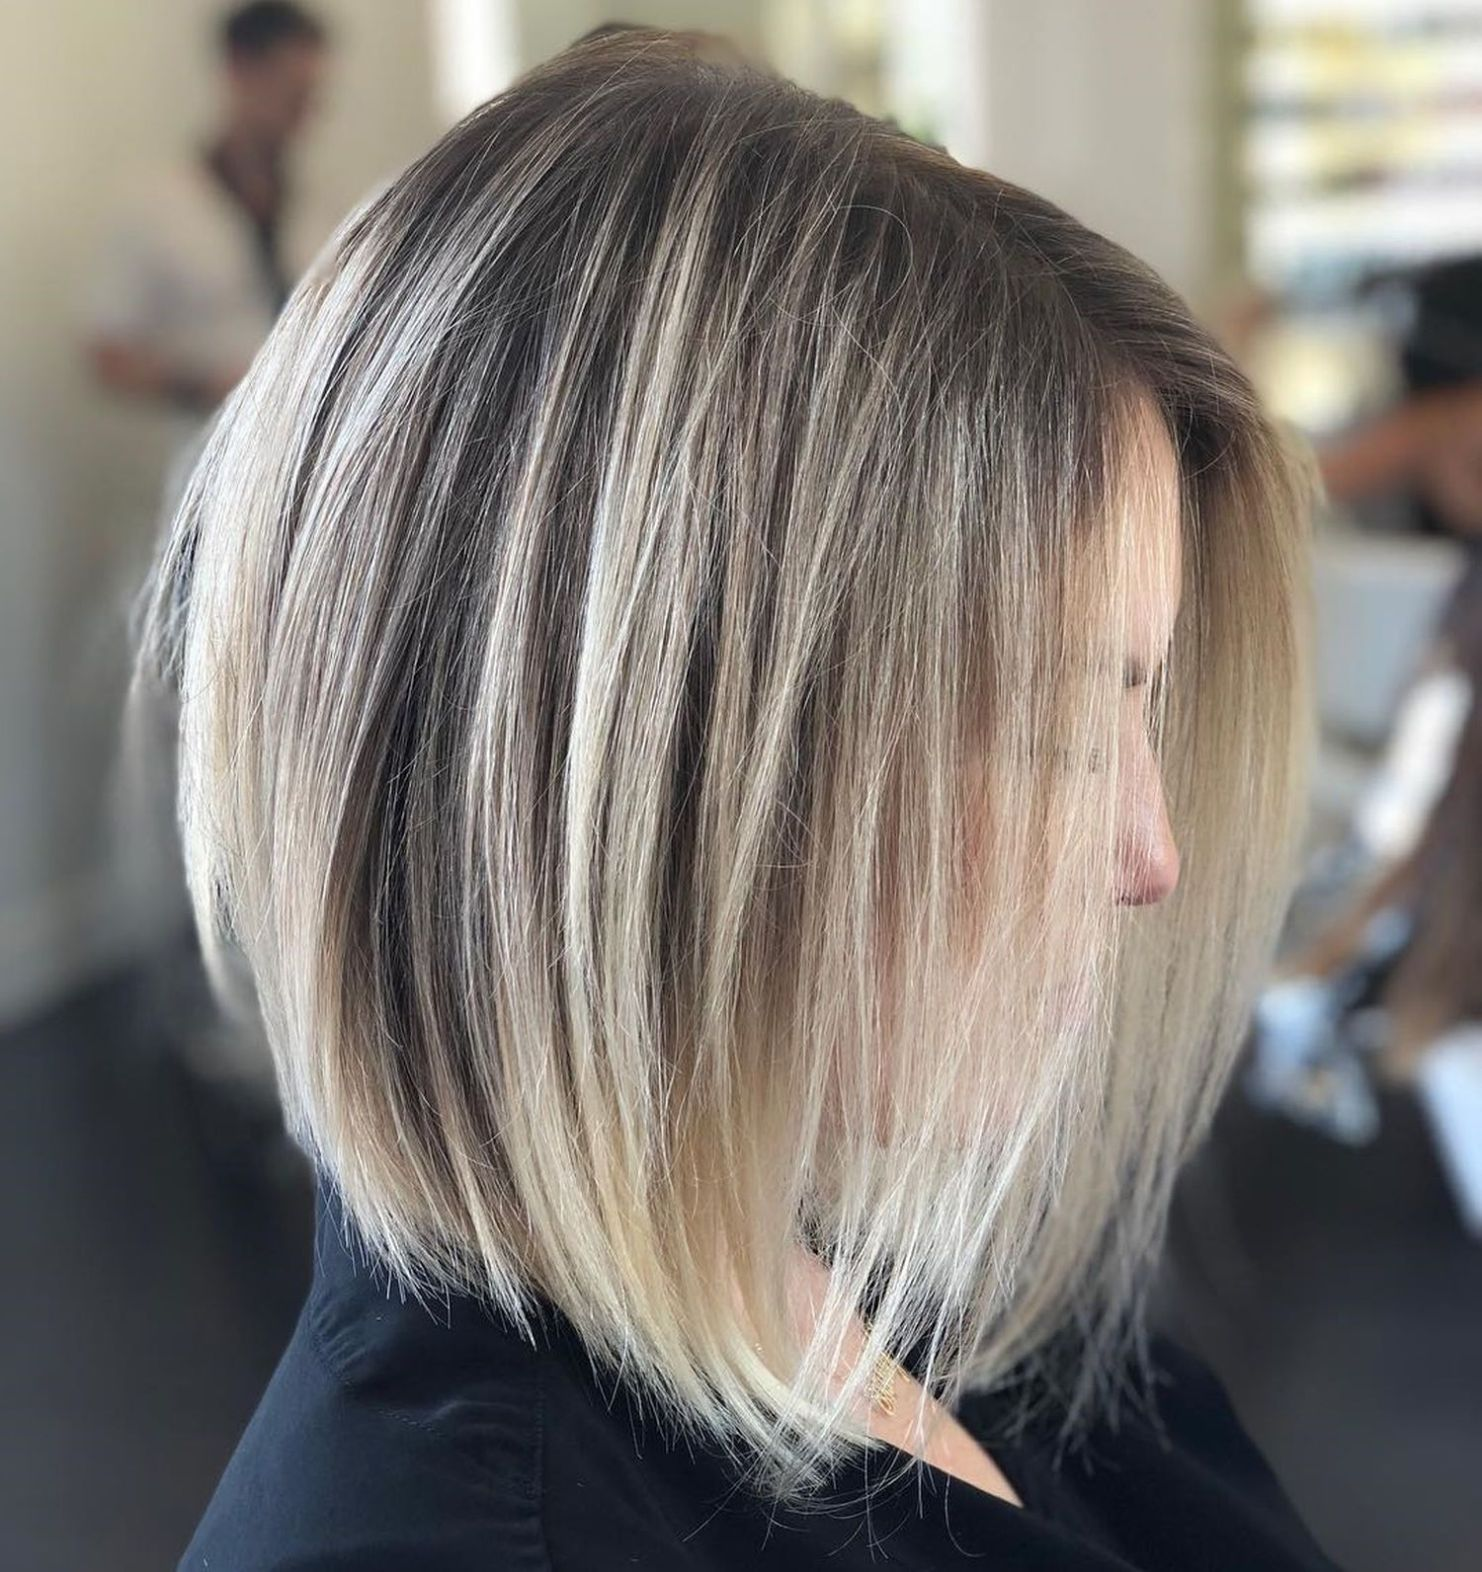 12 Perfect Medium Length Hairstyles for Thin Hair  Medium length